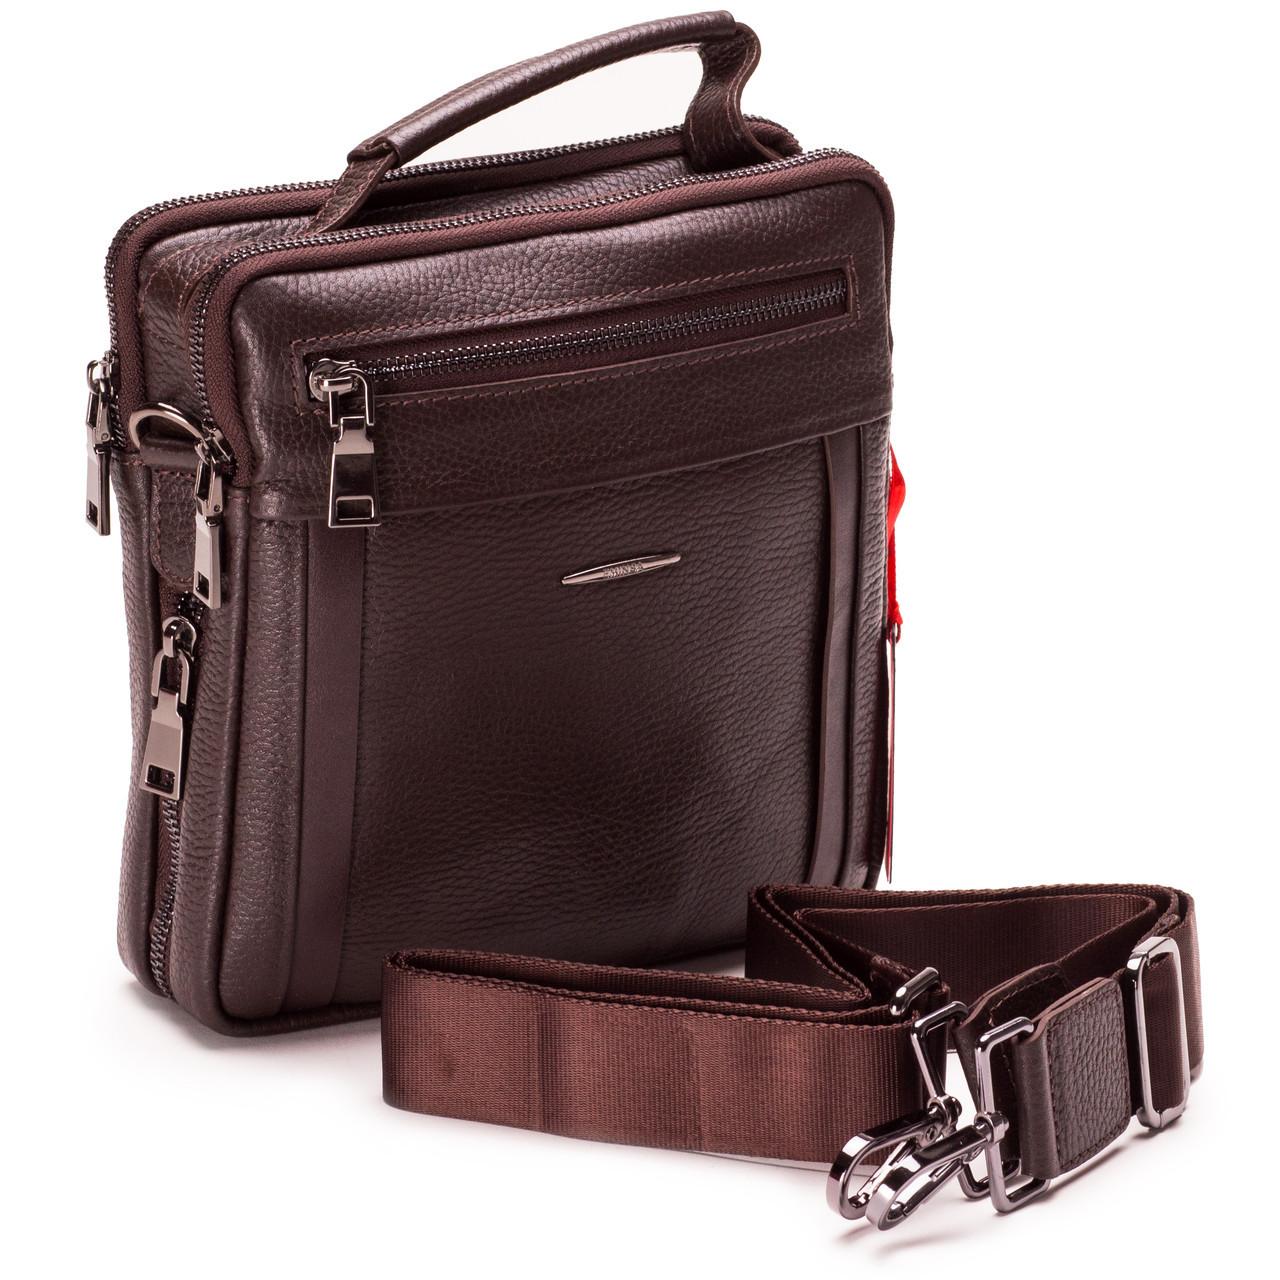 fbdc51a11d6f Мужская сумка кожаная коричневая Eminsa 6136-37-3: продажа, цена в ...